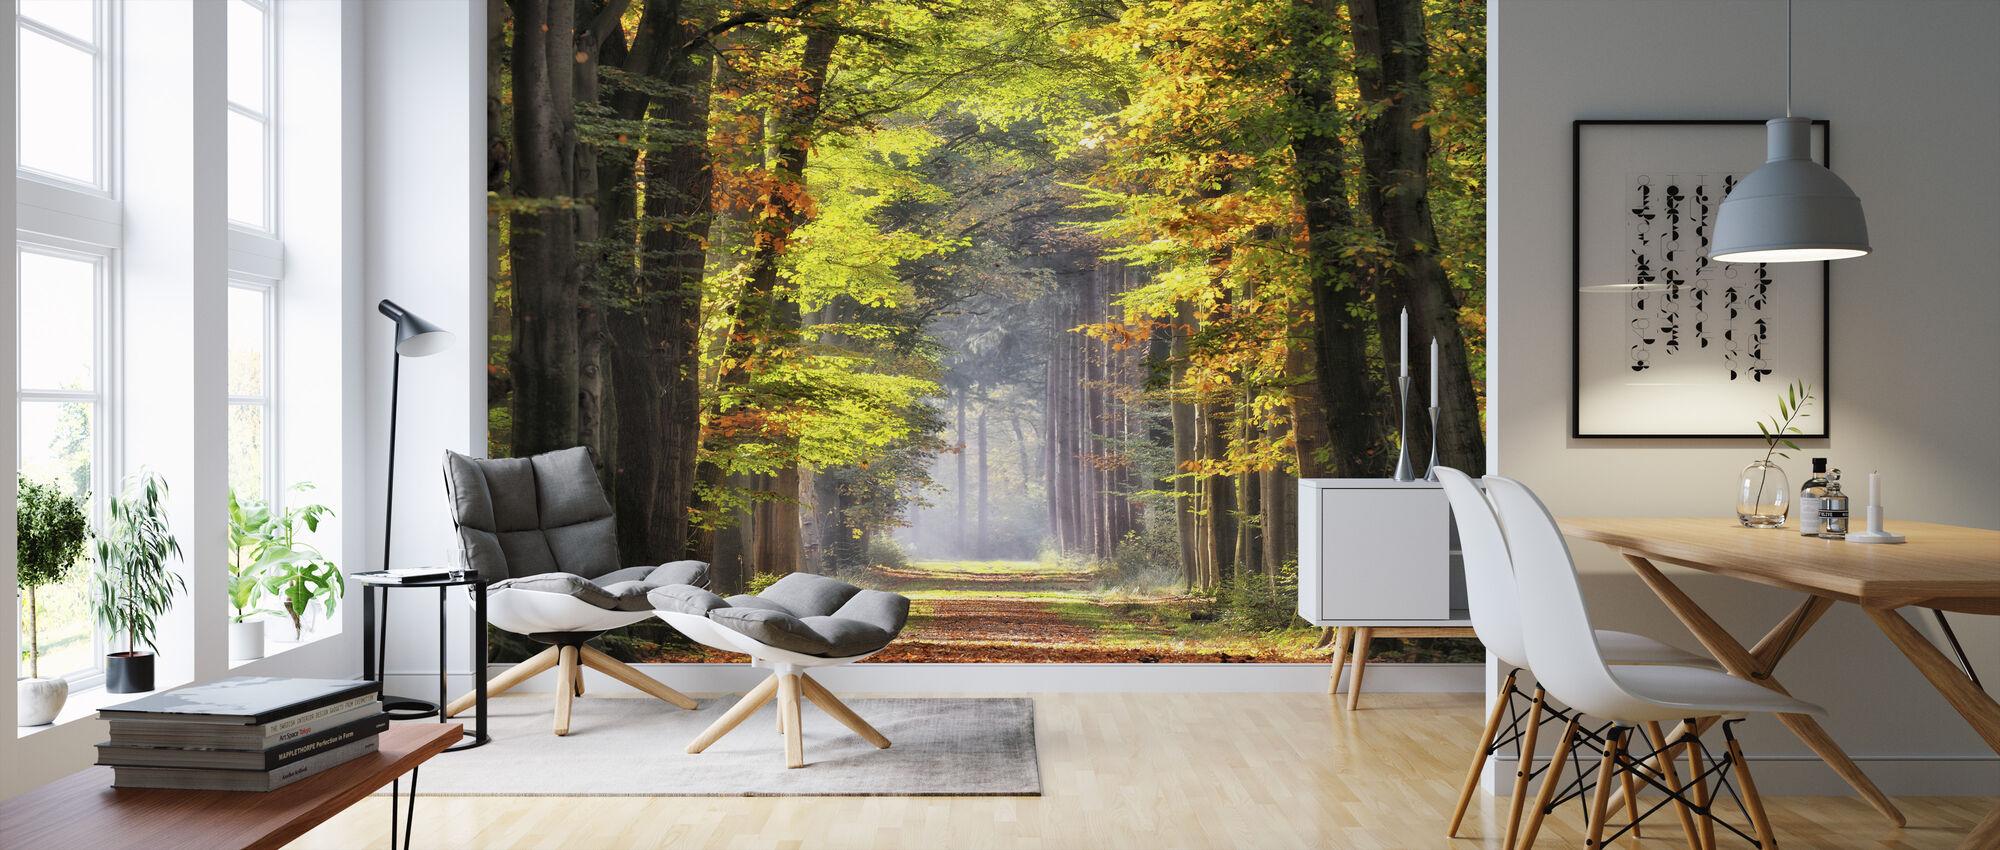 Avenue of Beech Trees - Wallpaper - Living Room